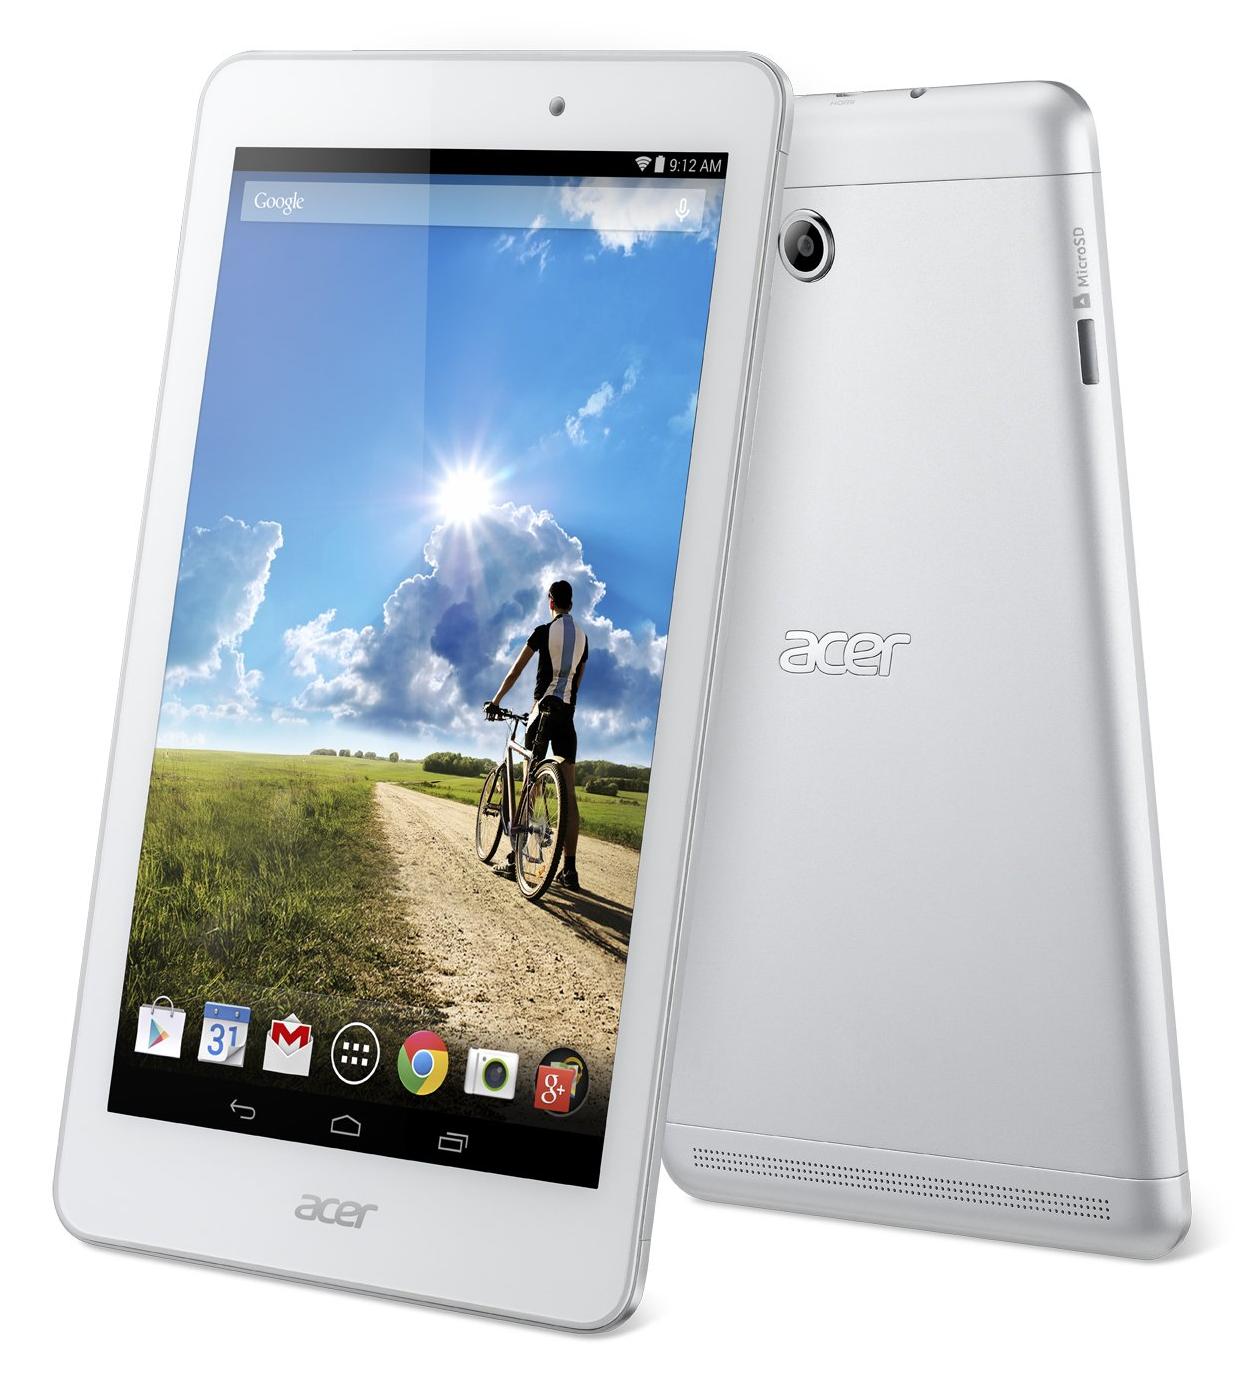 Novinky od Aceru: Iconia Tab 8, Liquid Jade a Leap